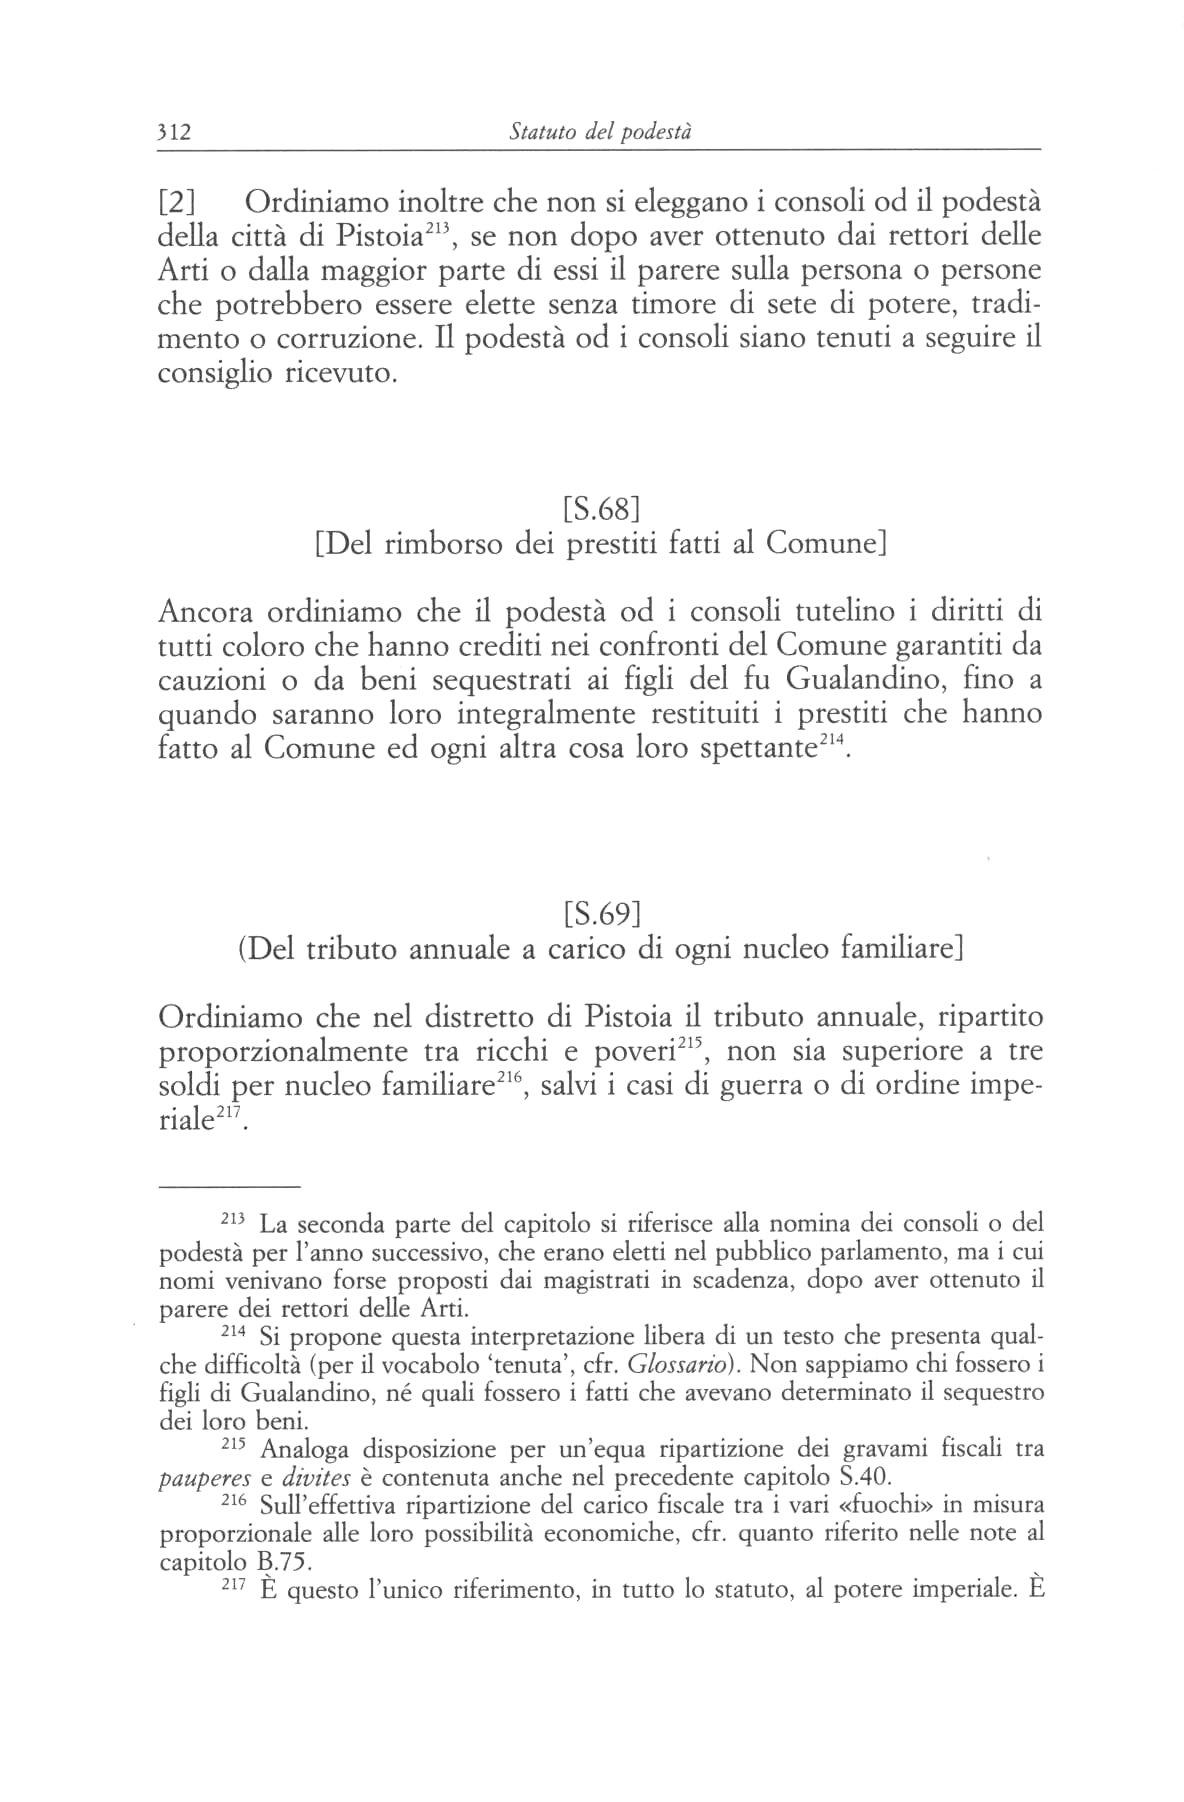 statuti pistoiesi del sec.XII 0312.jpg